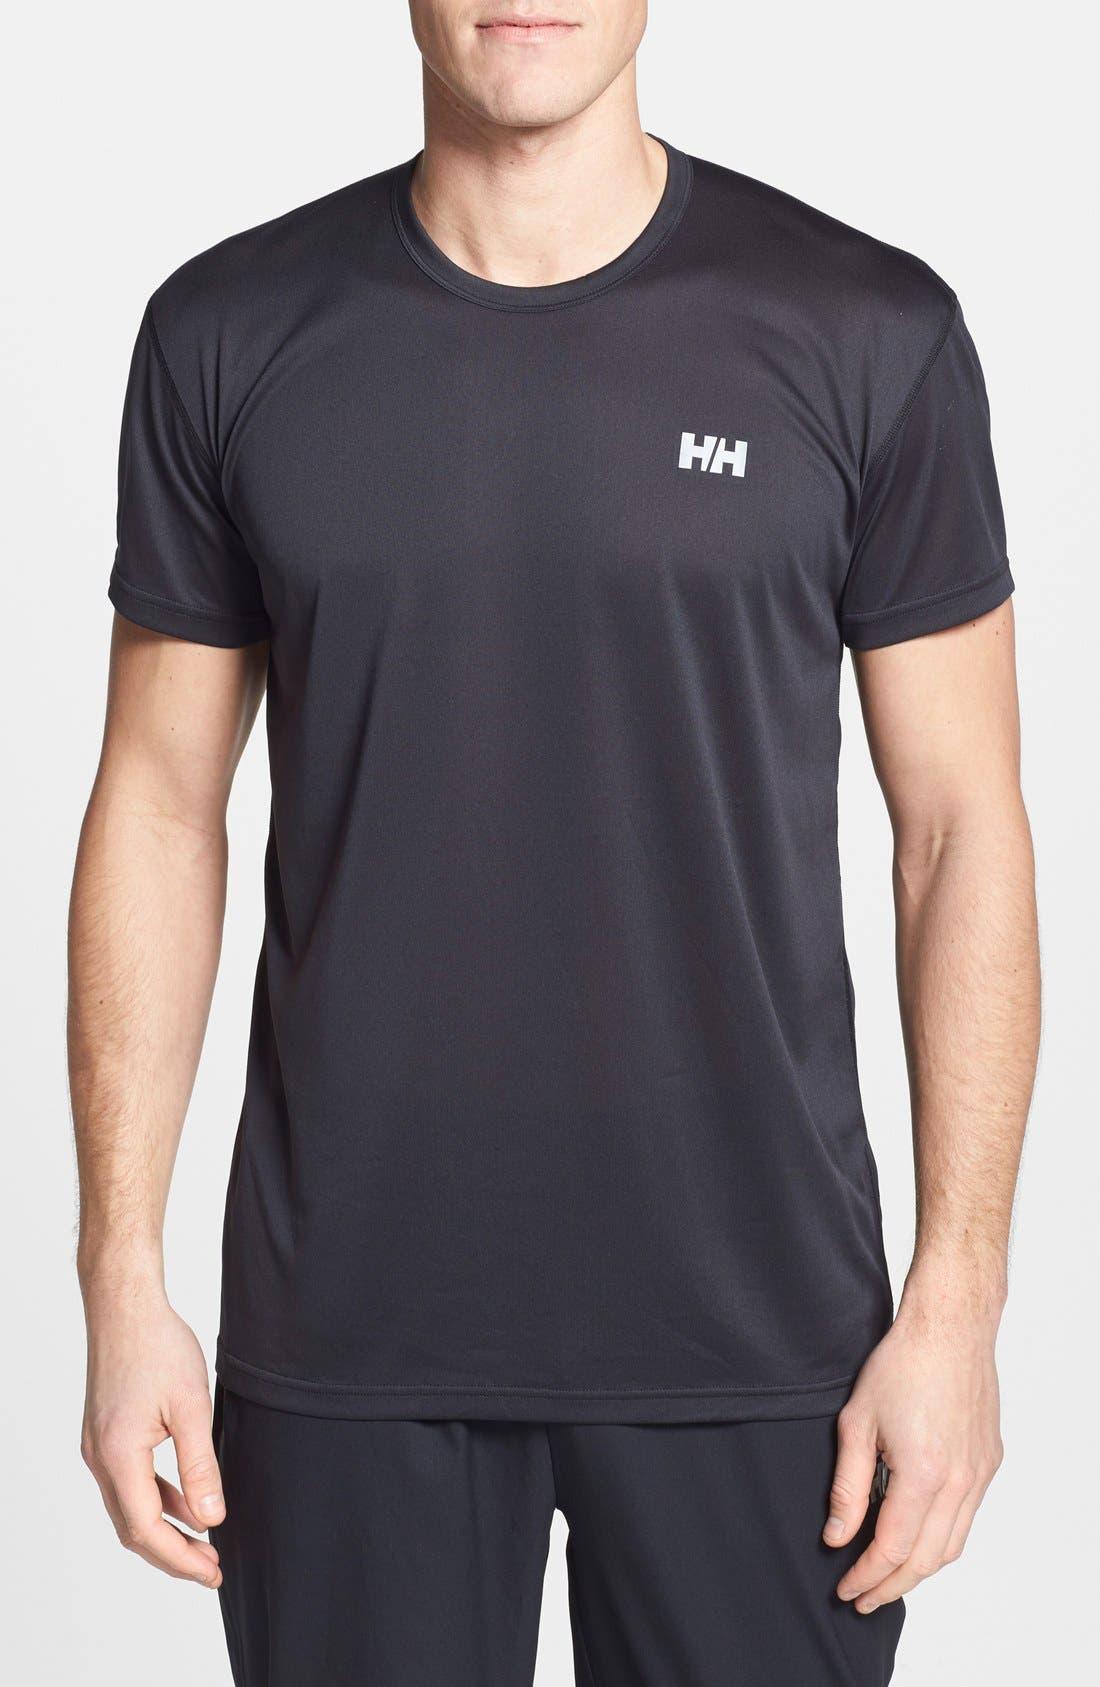 HELLY HANSEN 'VTR' Quick Dry T-Shirt, Main, color, 001